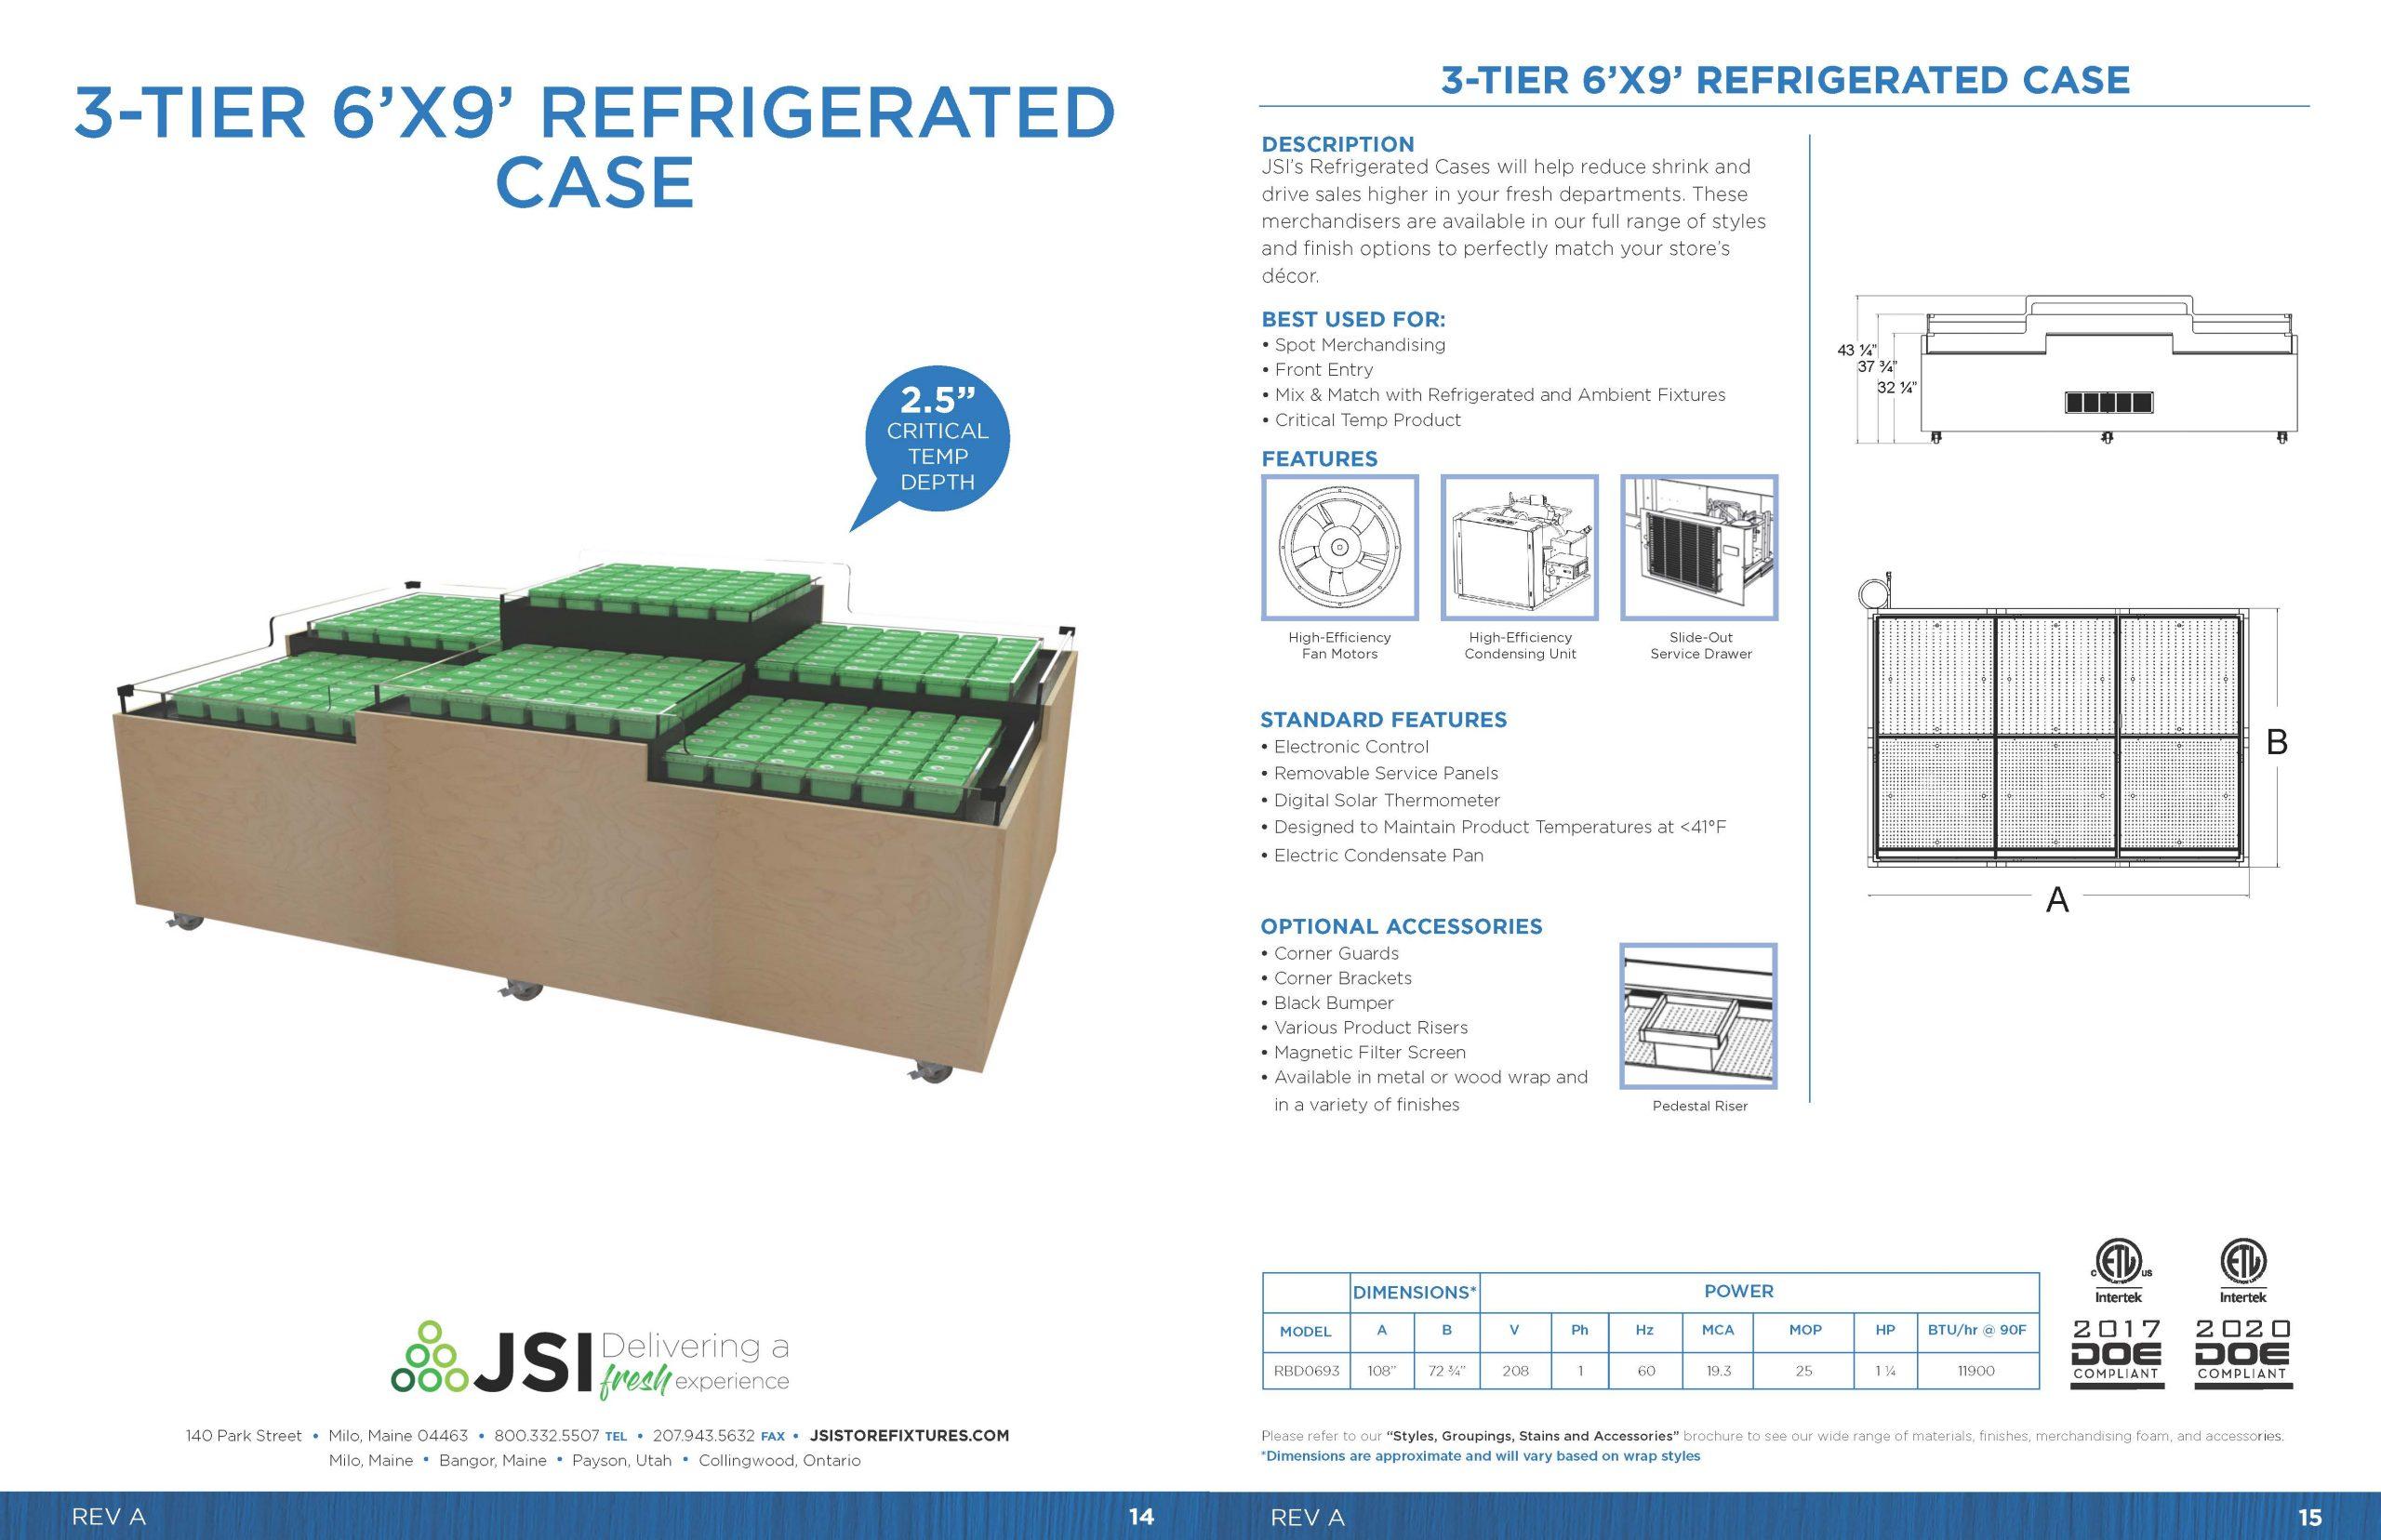 3-Tier 6x9 Refrigerated Case